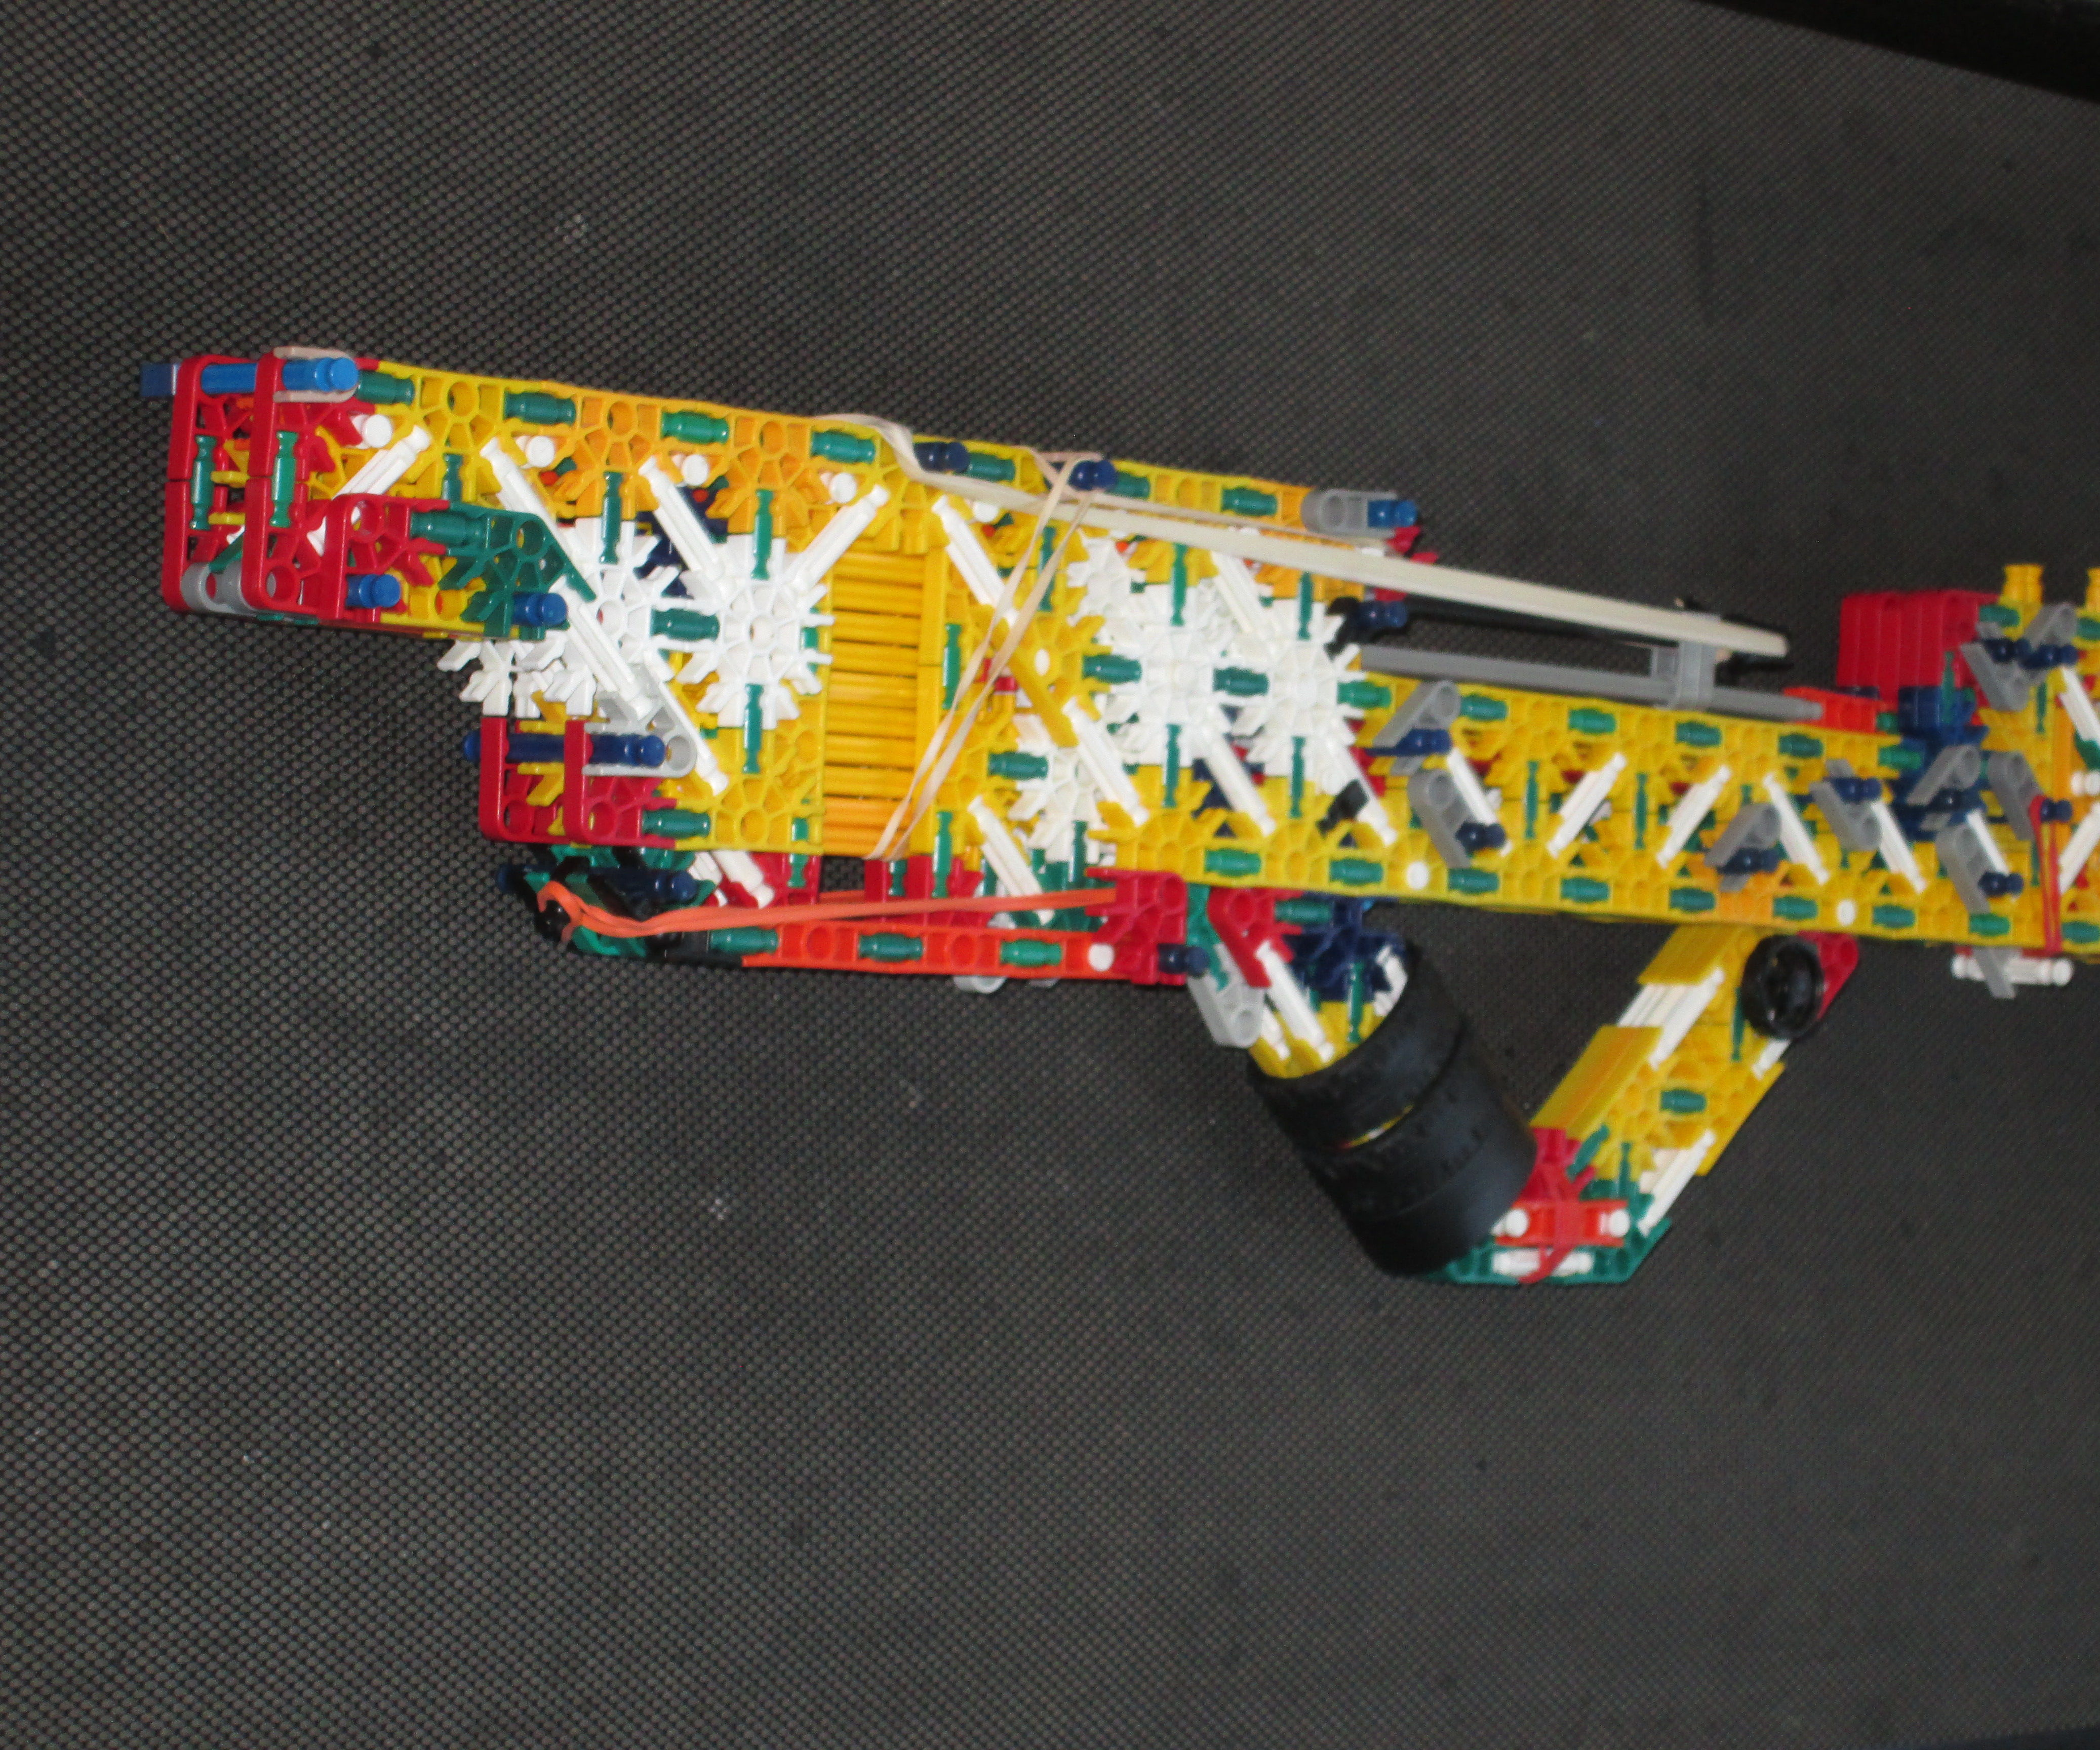 SKBR Sonic broom's knex rifle